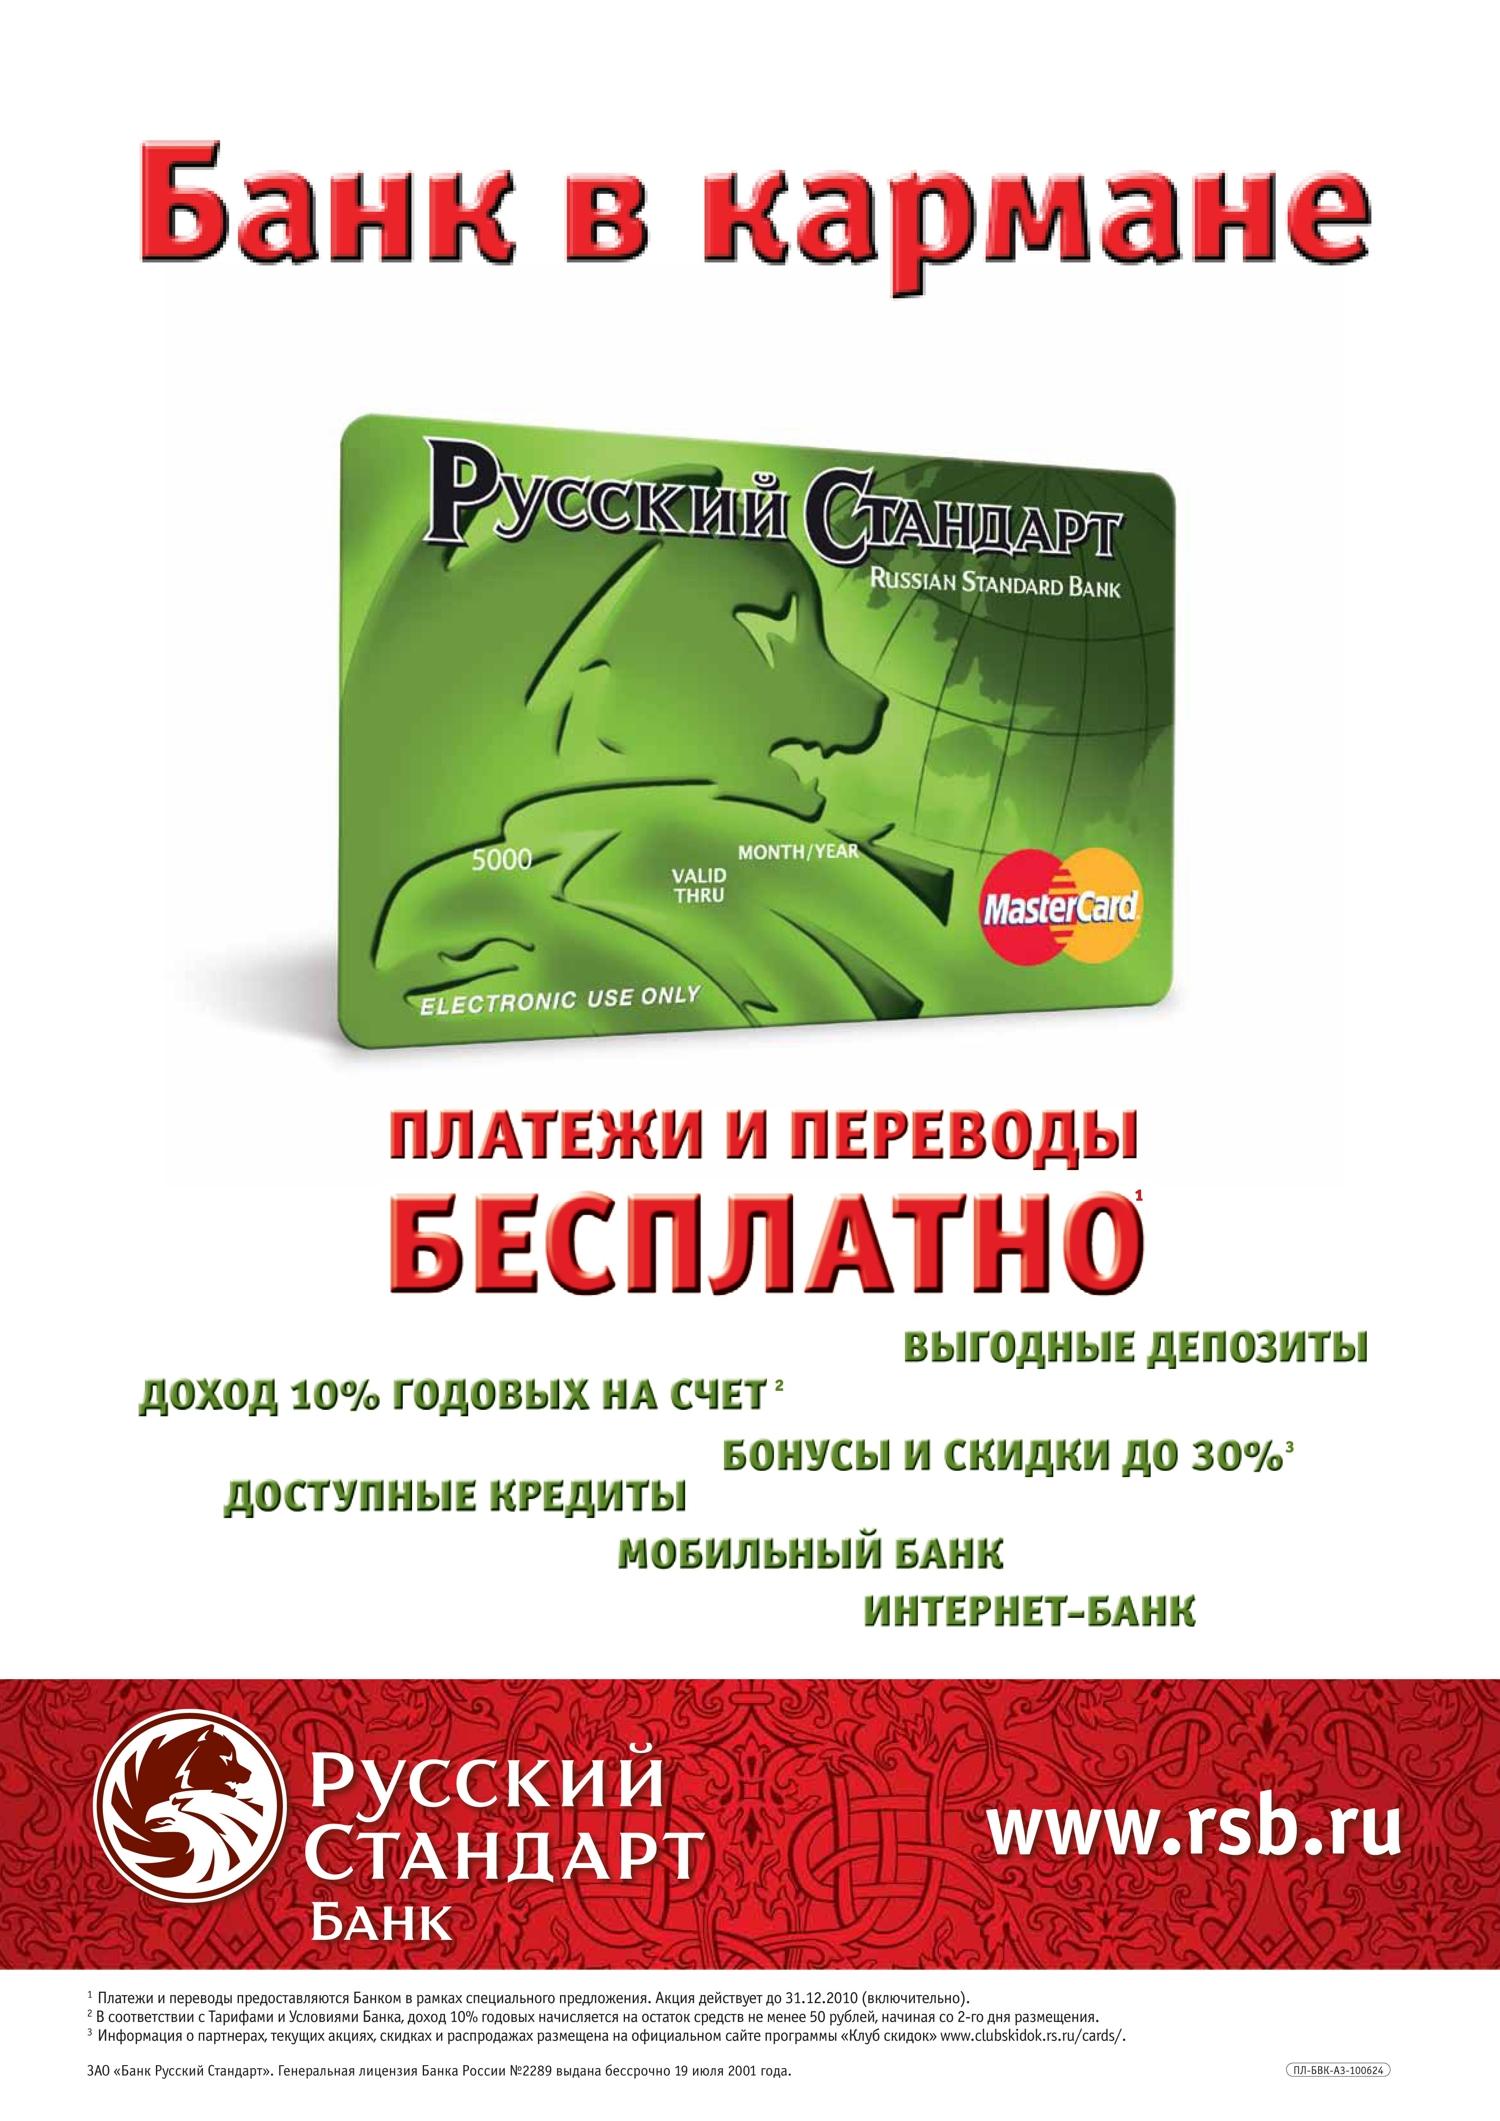 Банк русский стандарт логотип ...: pictures11.ru/bank-russkij-standart-logotip.html